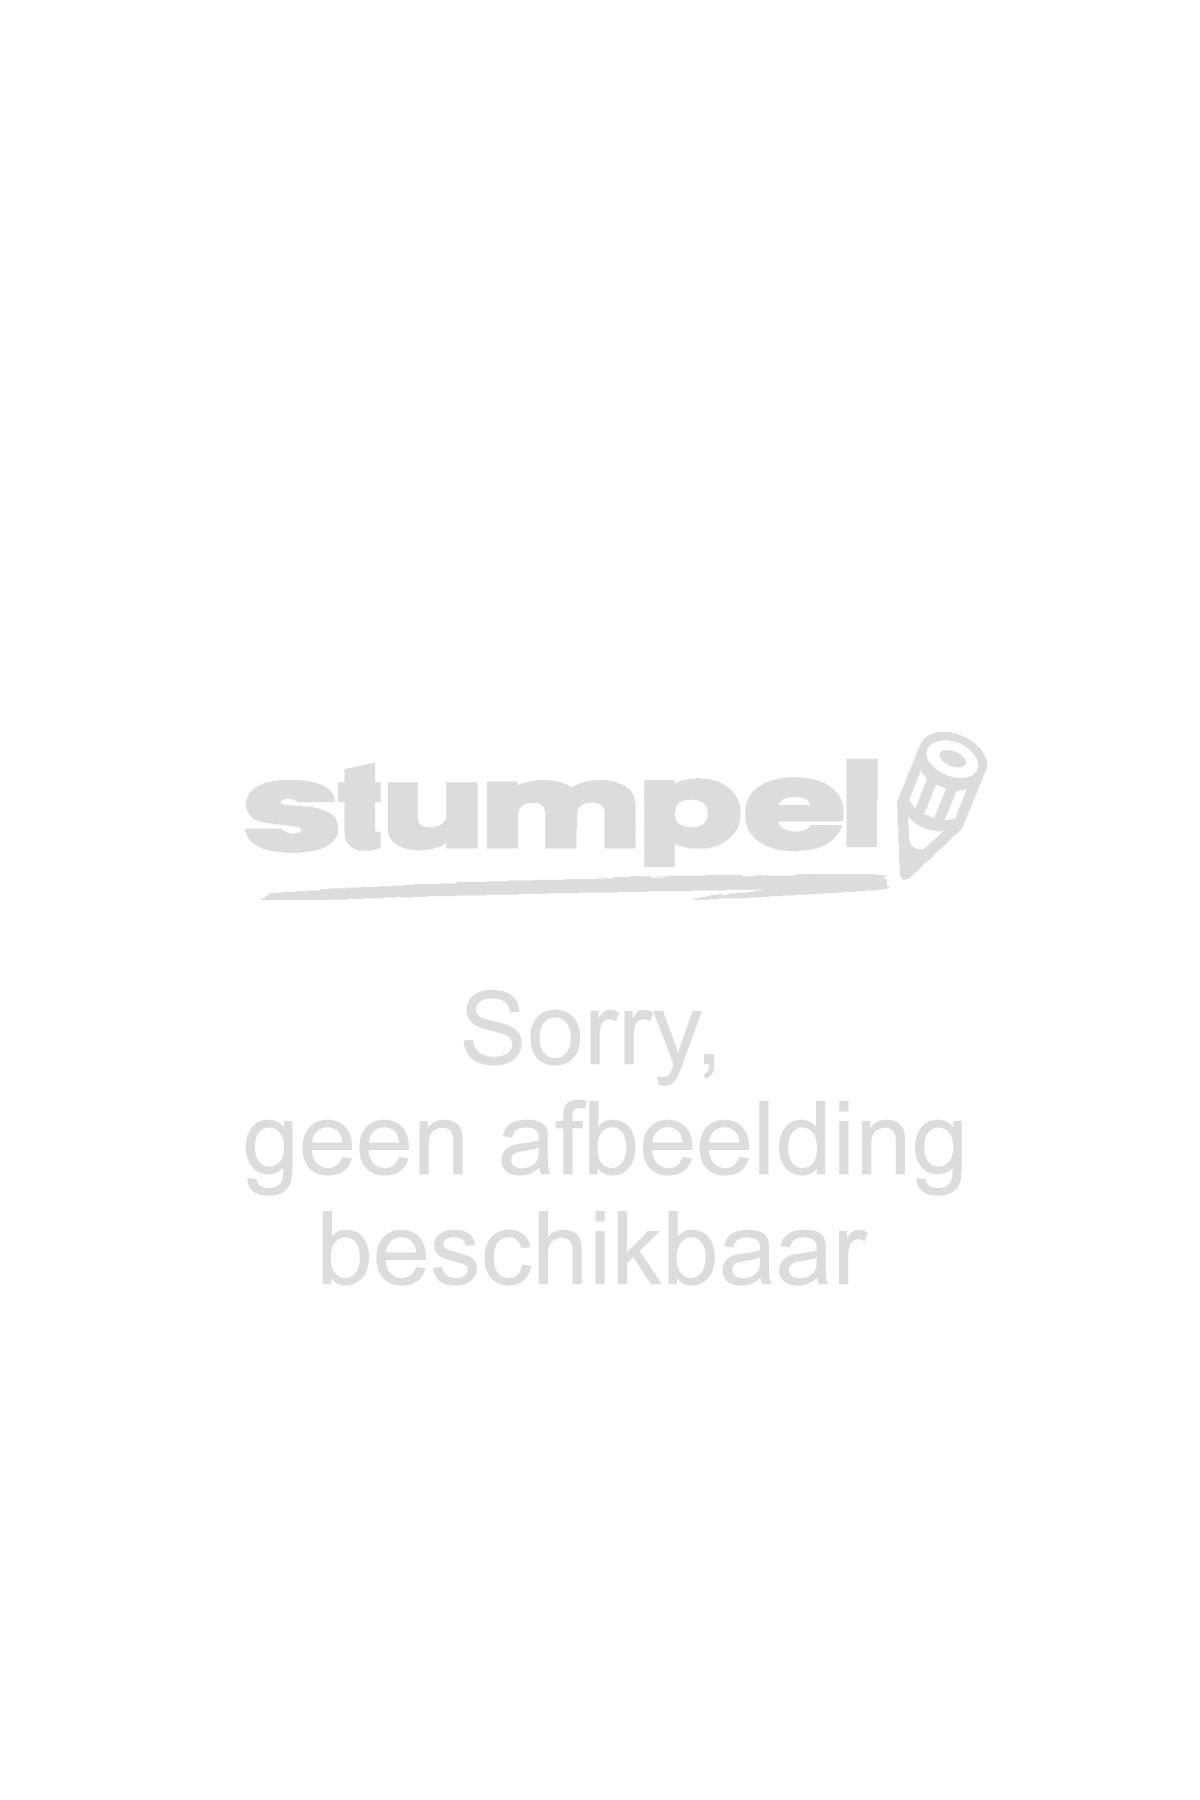 Passer Rotring Compact S0676580 inzetpasser